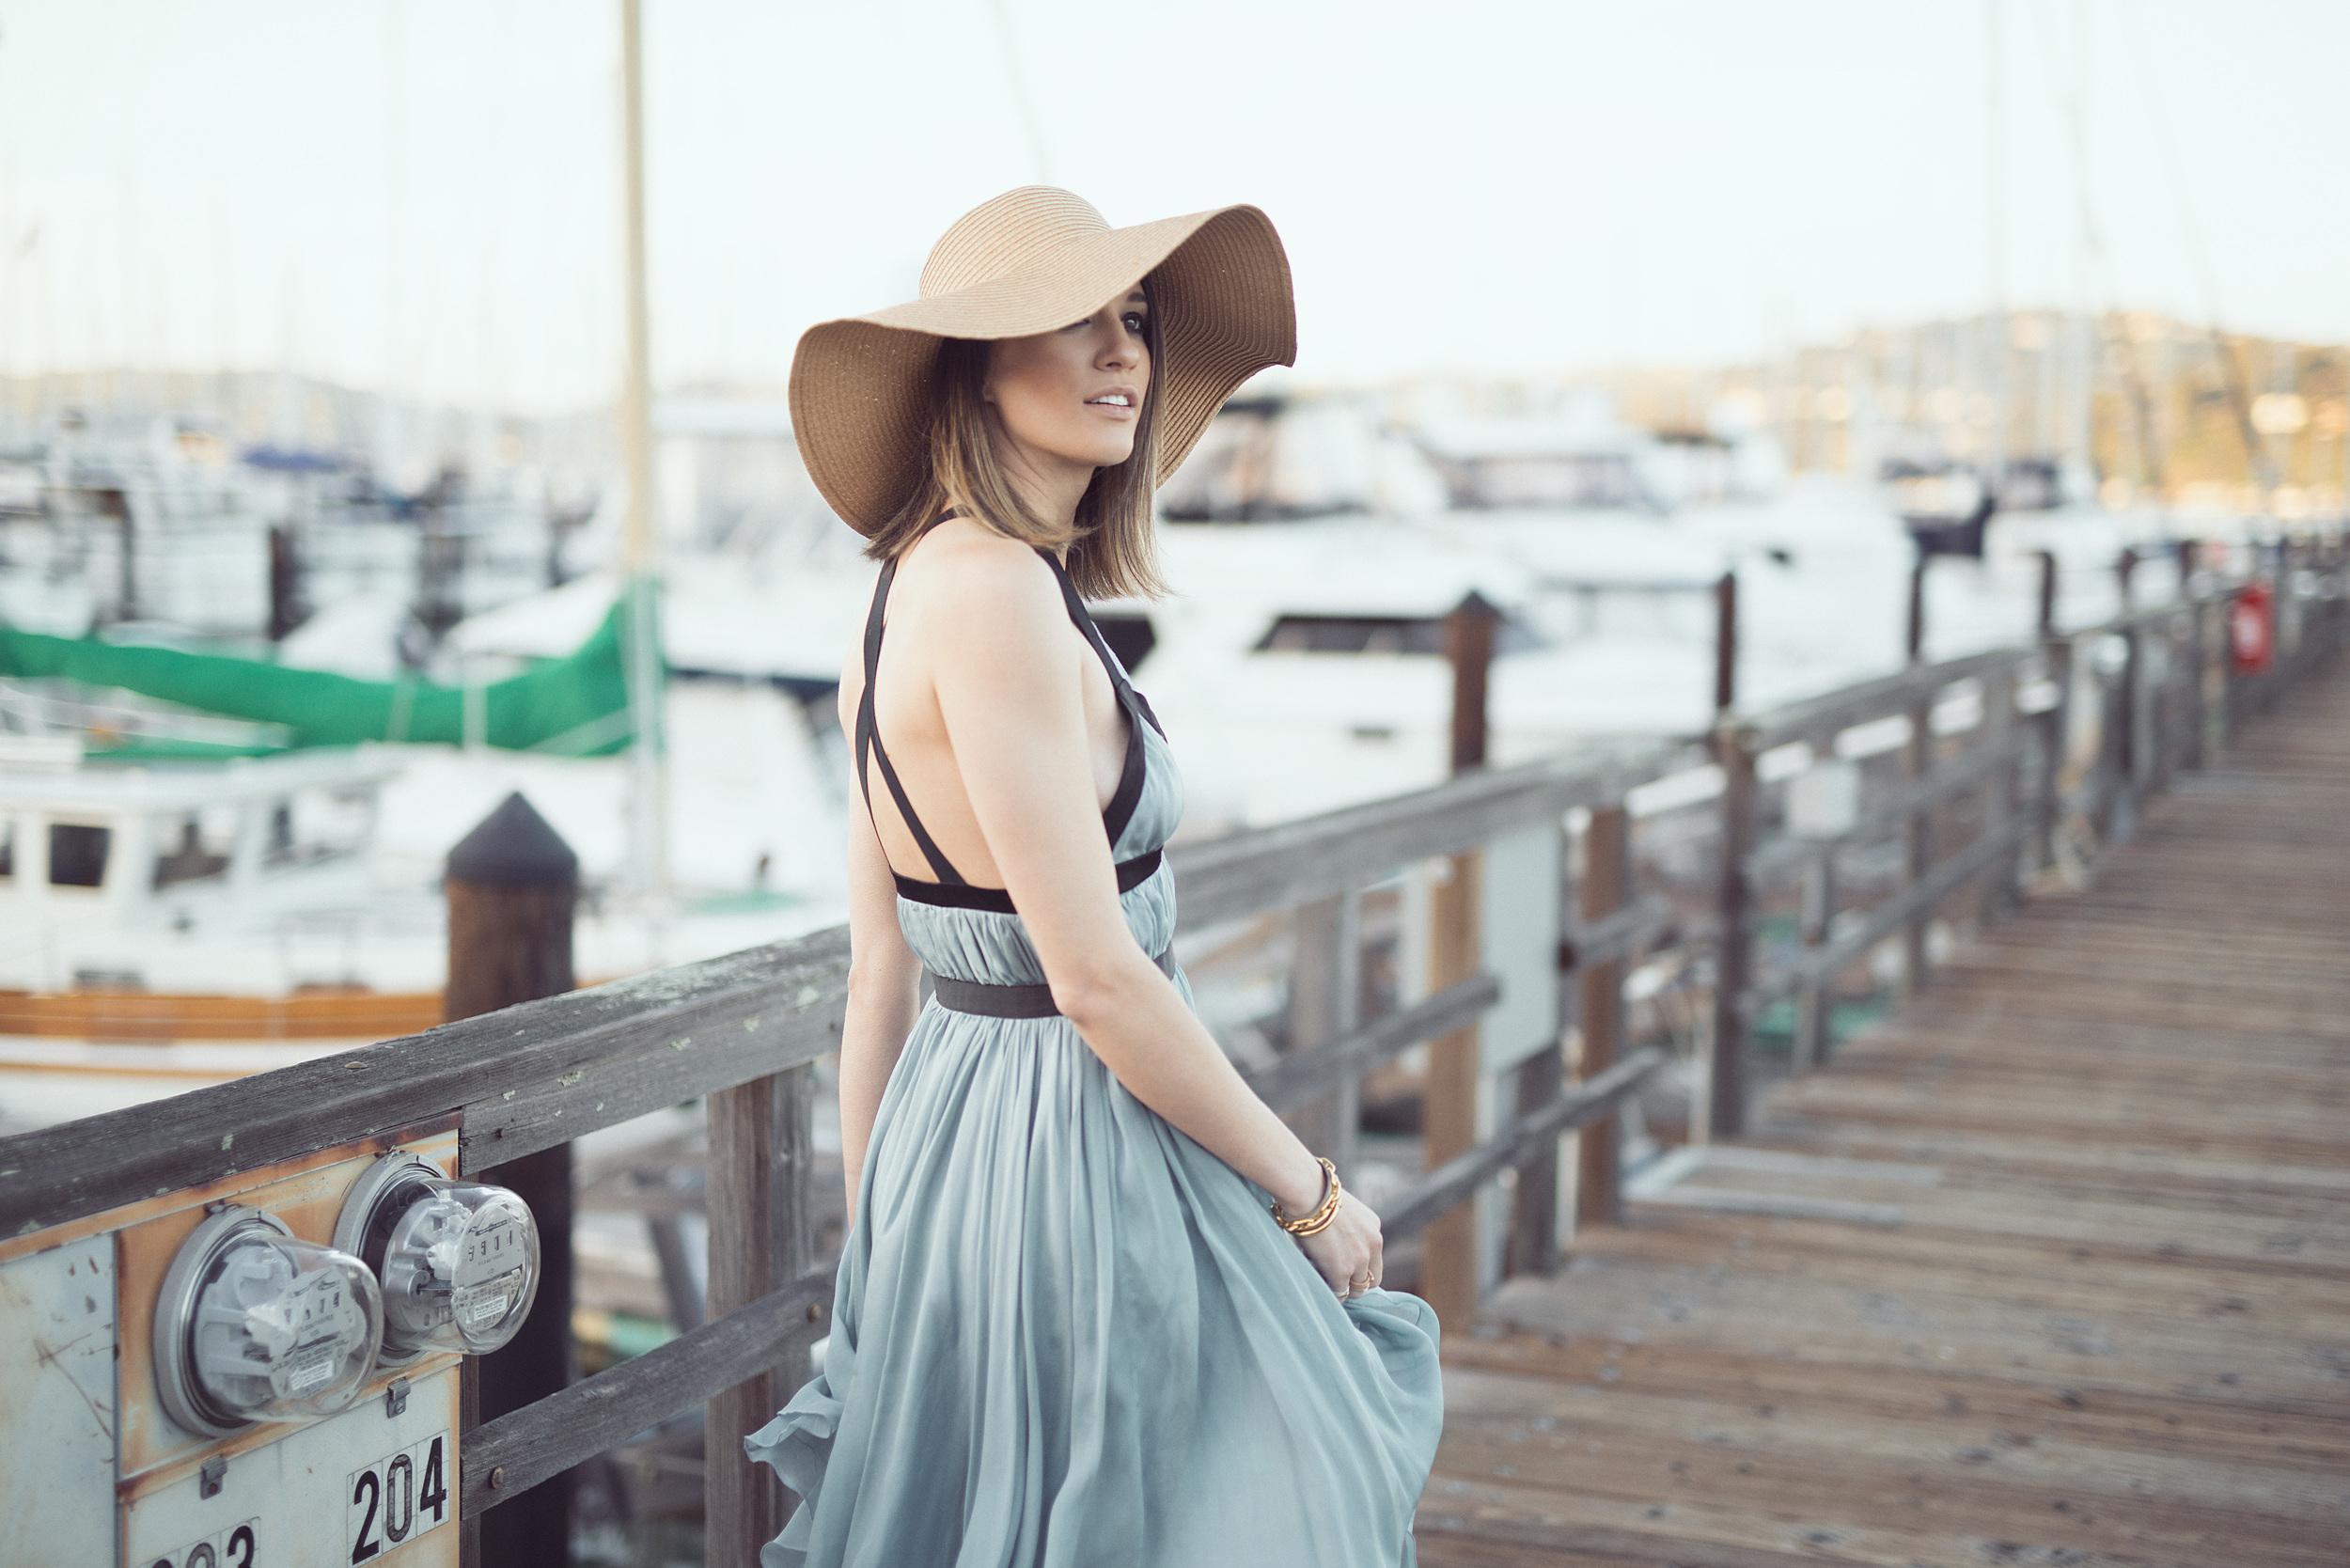 blue-dress-san-francisco-beach-travel